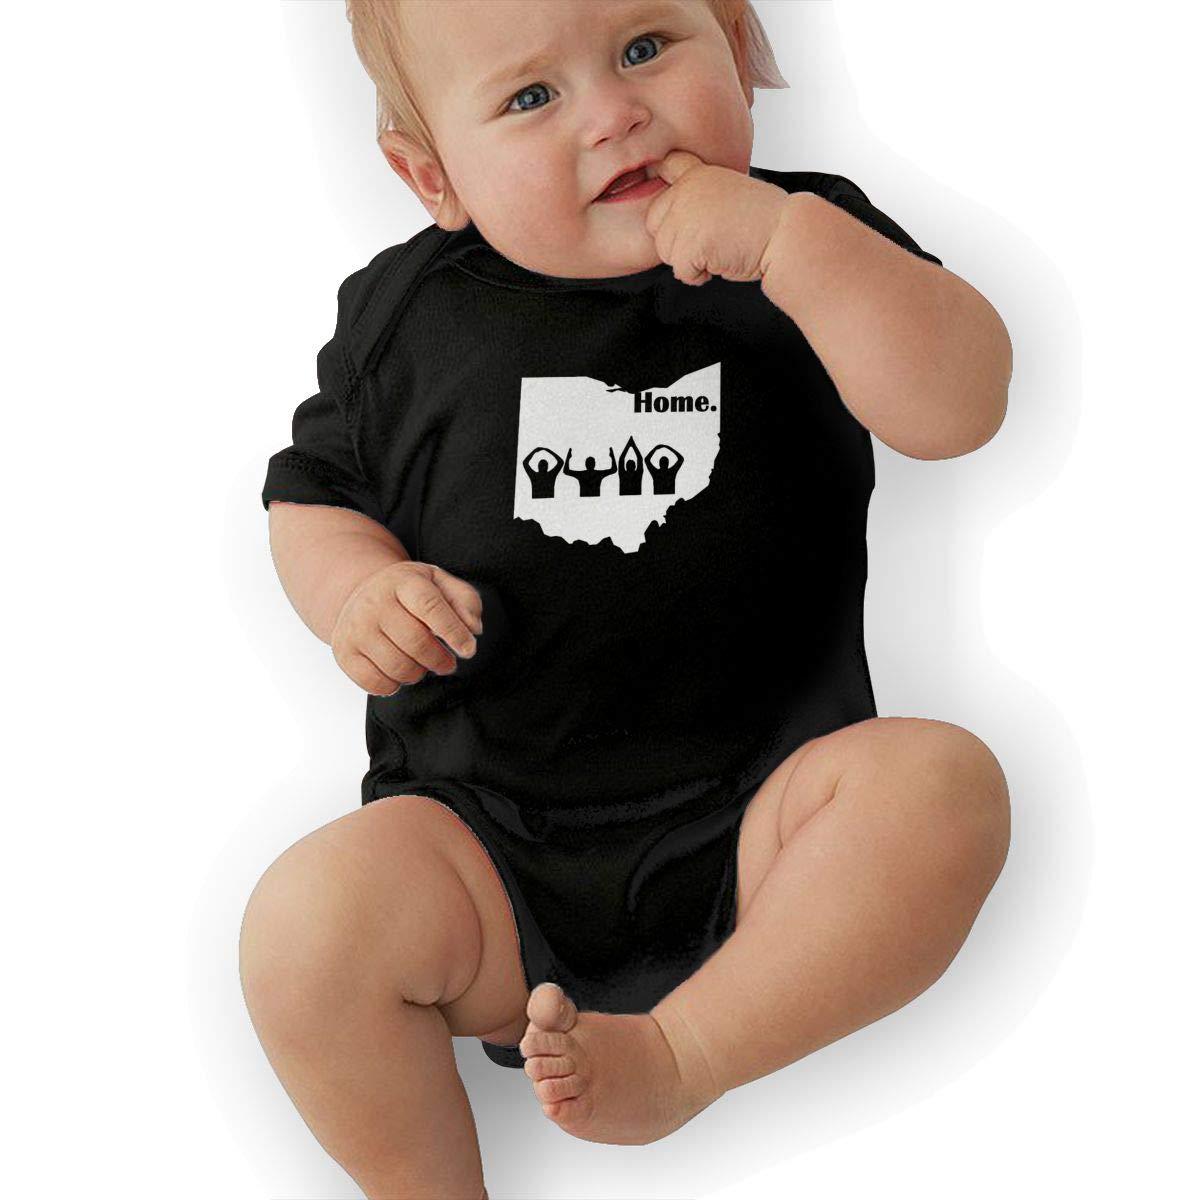 Manlee Ohio Home State Newborn Infant Toddler Baby Girls Boys Bodysuit Short Sleeve 0-24 MonthsBlack